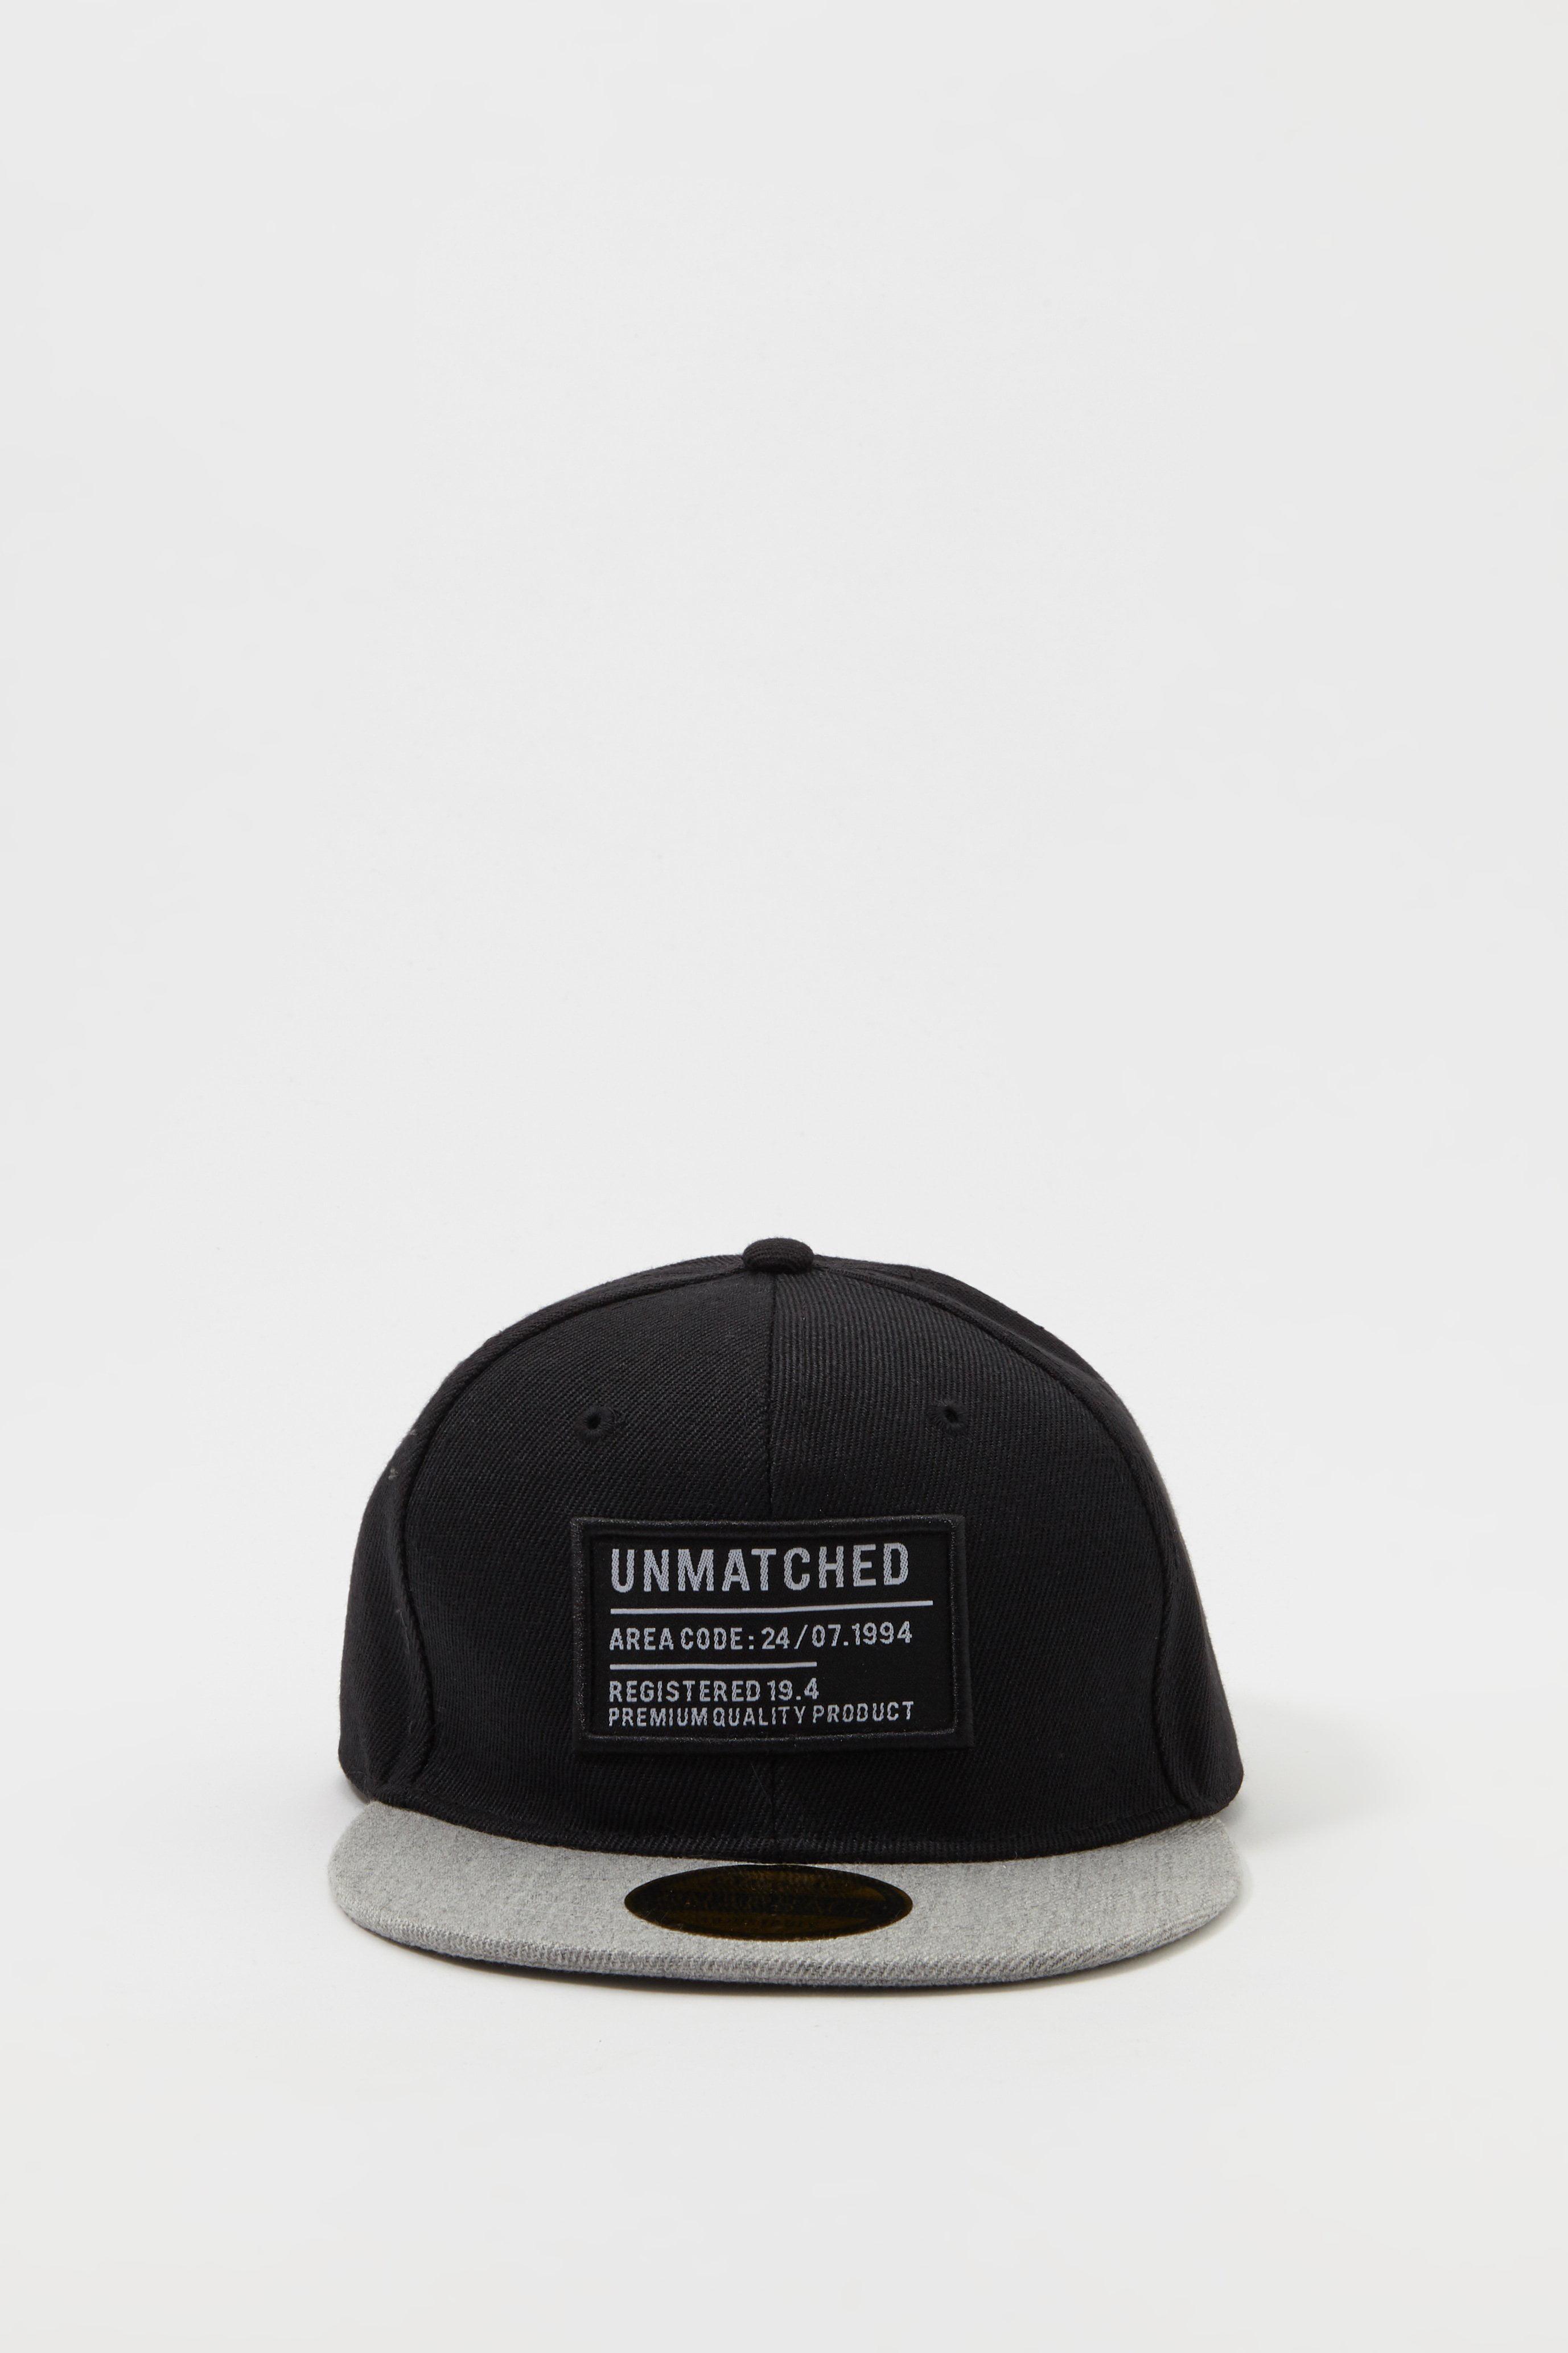 c8b235e356 Urban Kids Youth Boys Unmatched Snapback Hat